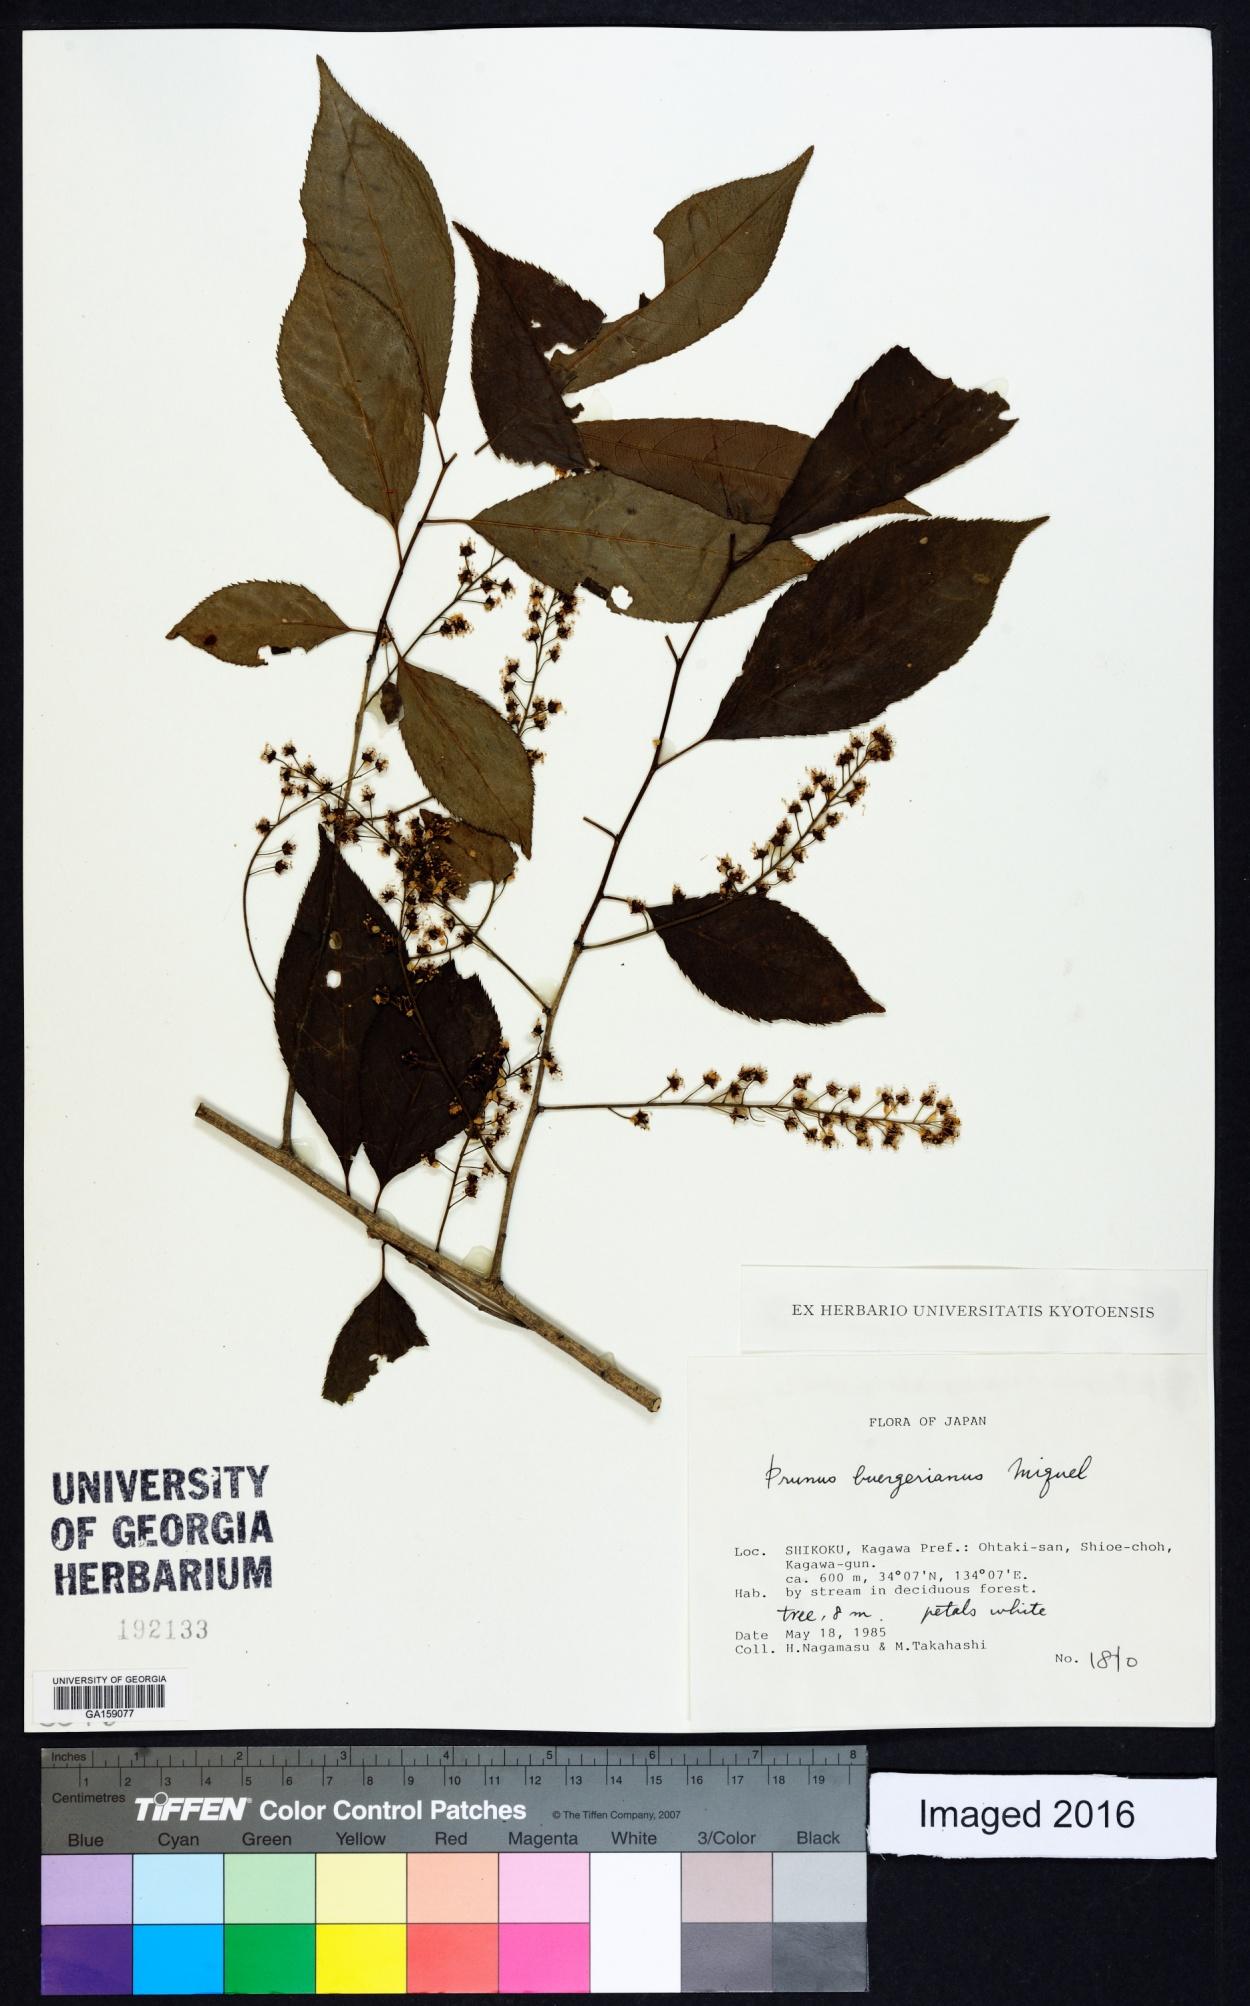 Prunus buergeriana image